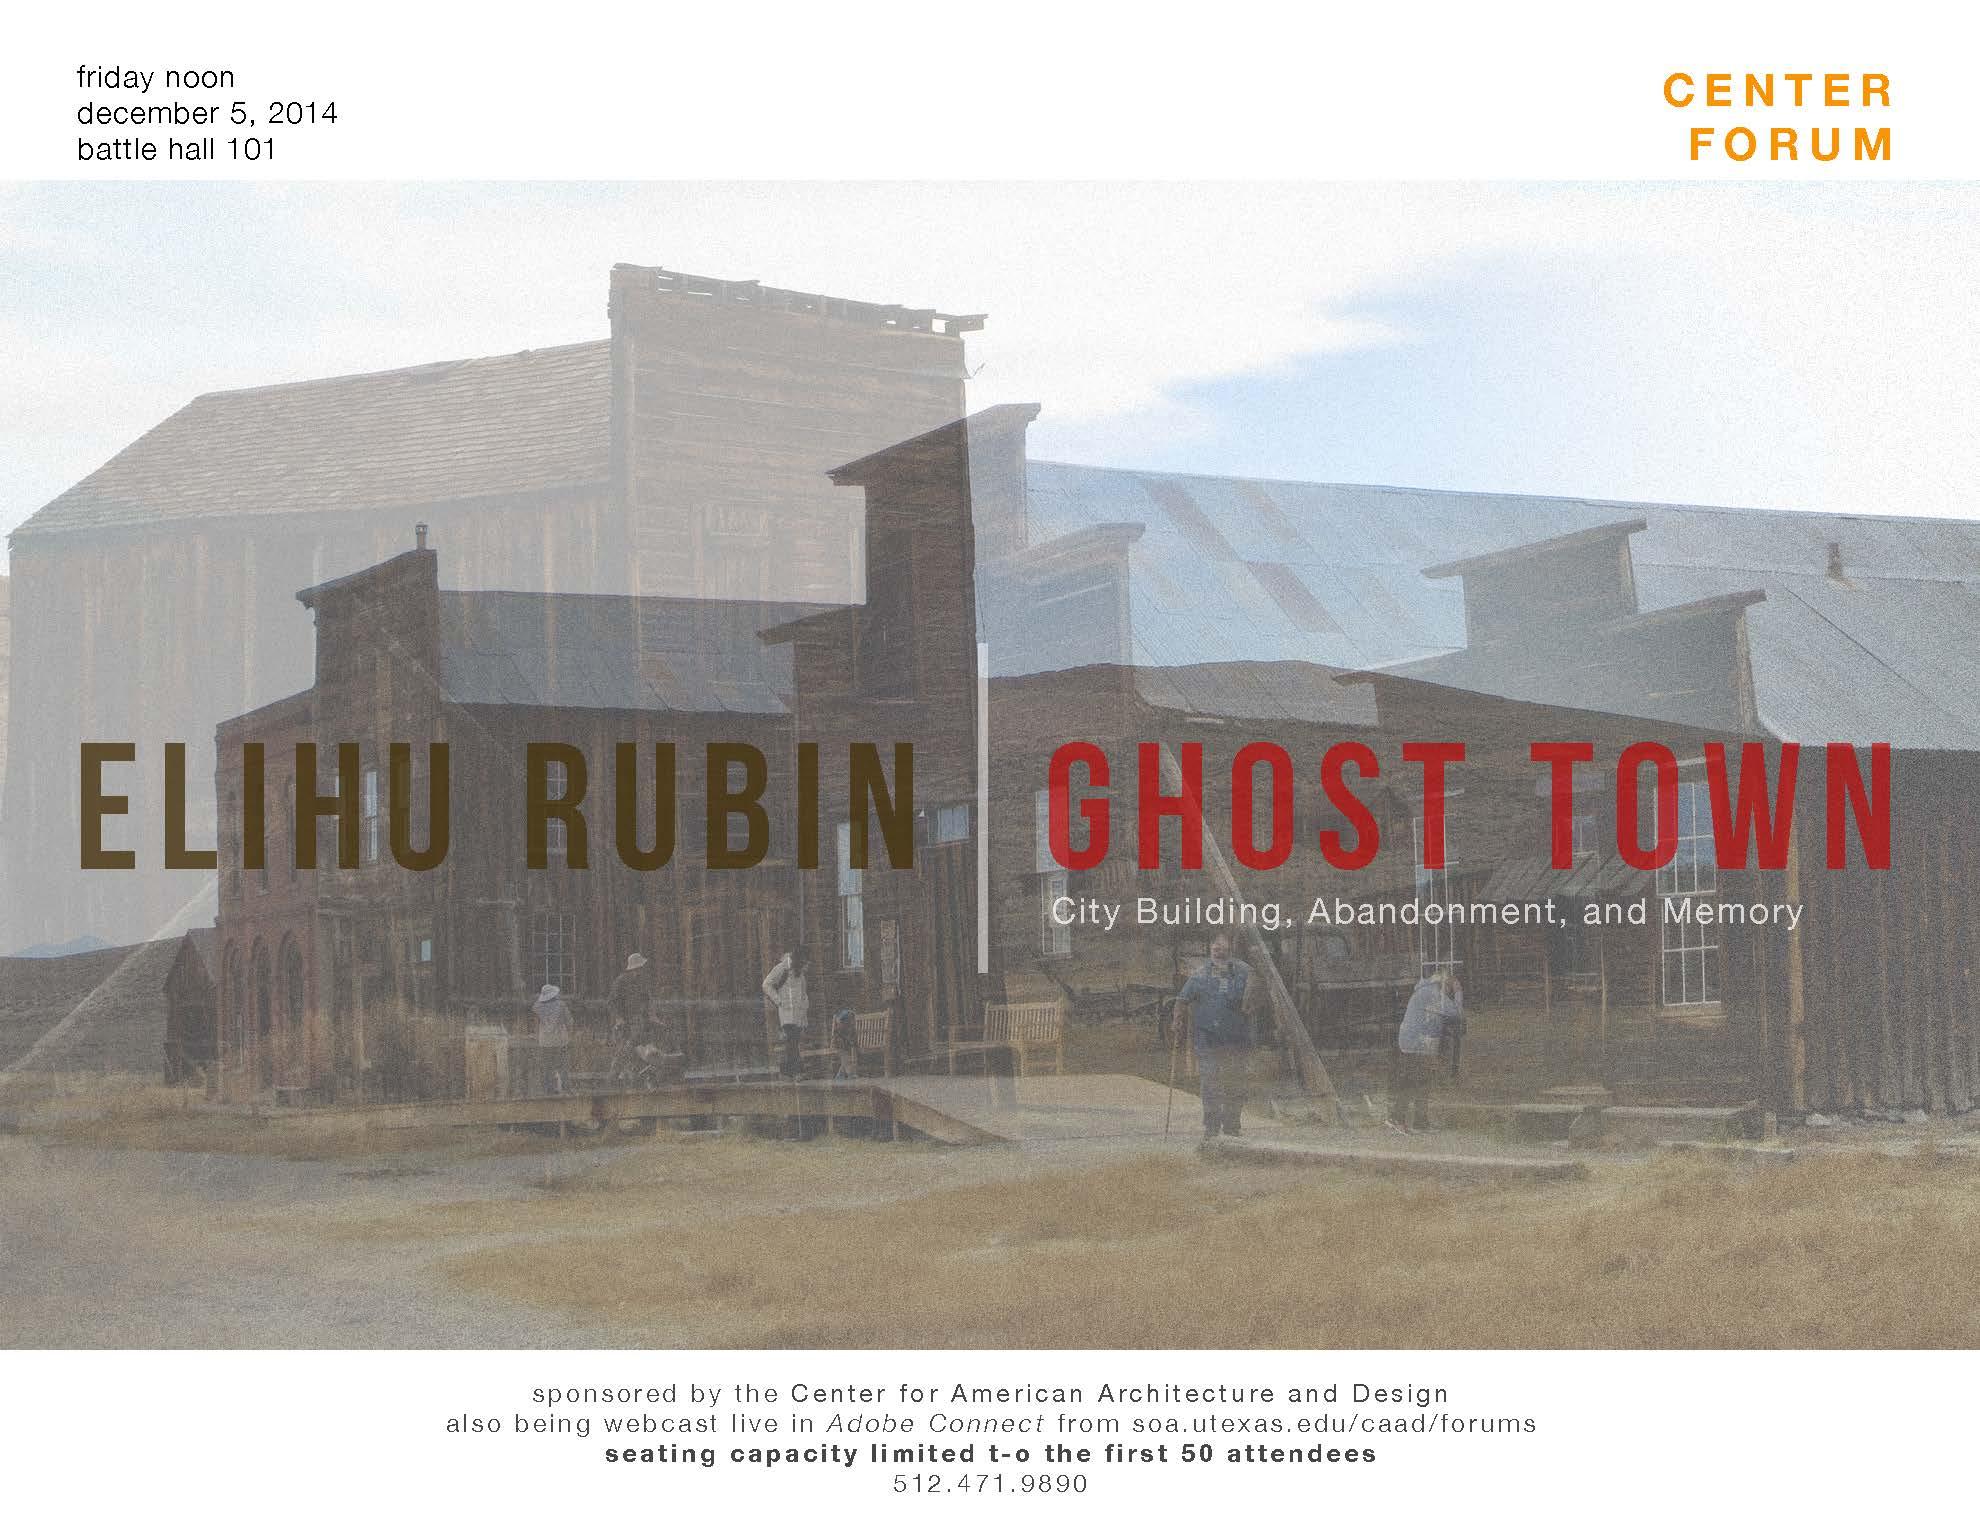 ELIHU RUBIN HOSTS FRIDAY LUNCH FORUM: GHOST TOWN